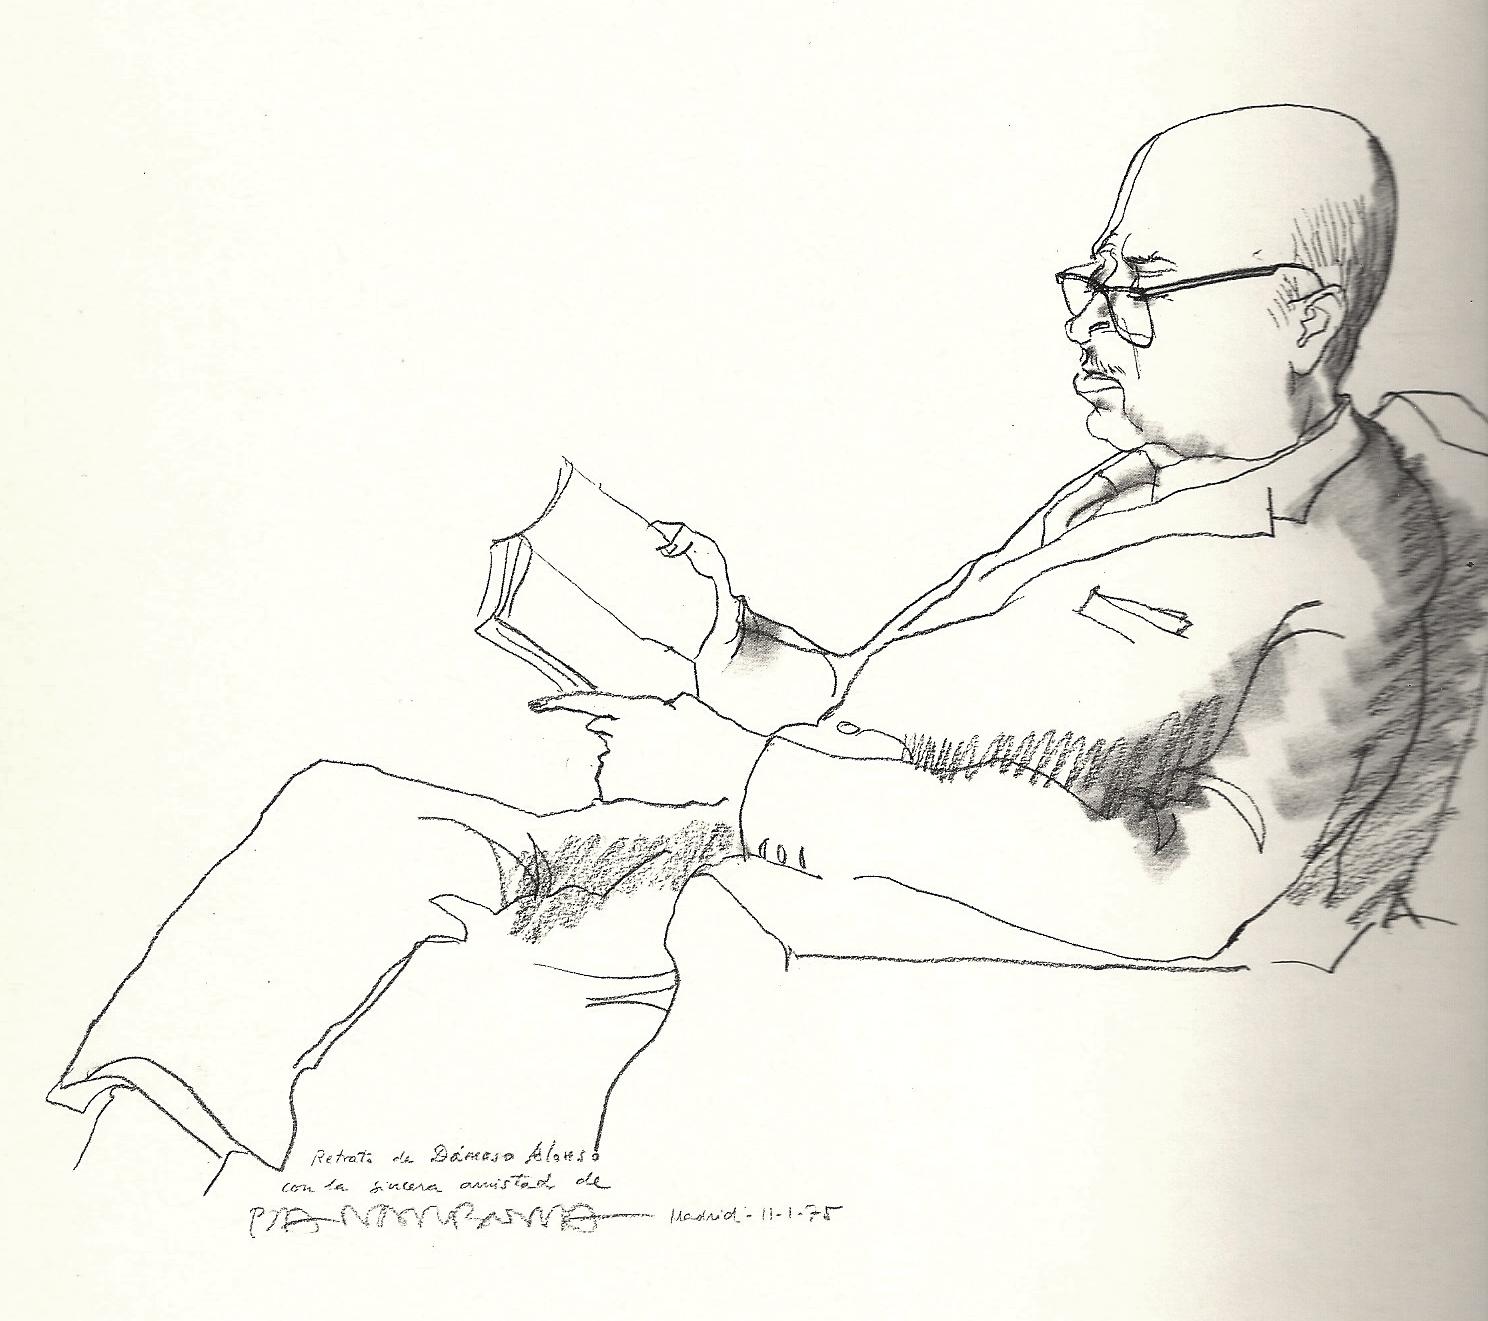 Alonso portrait by [[Josep Pla-Narbona]]